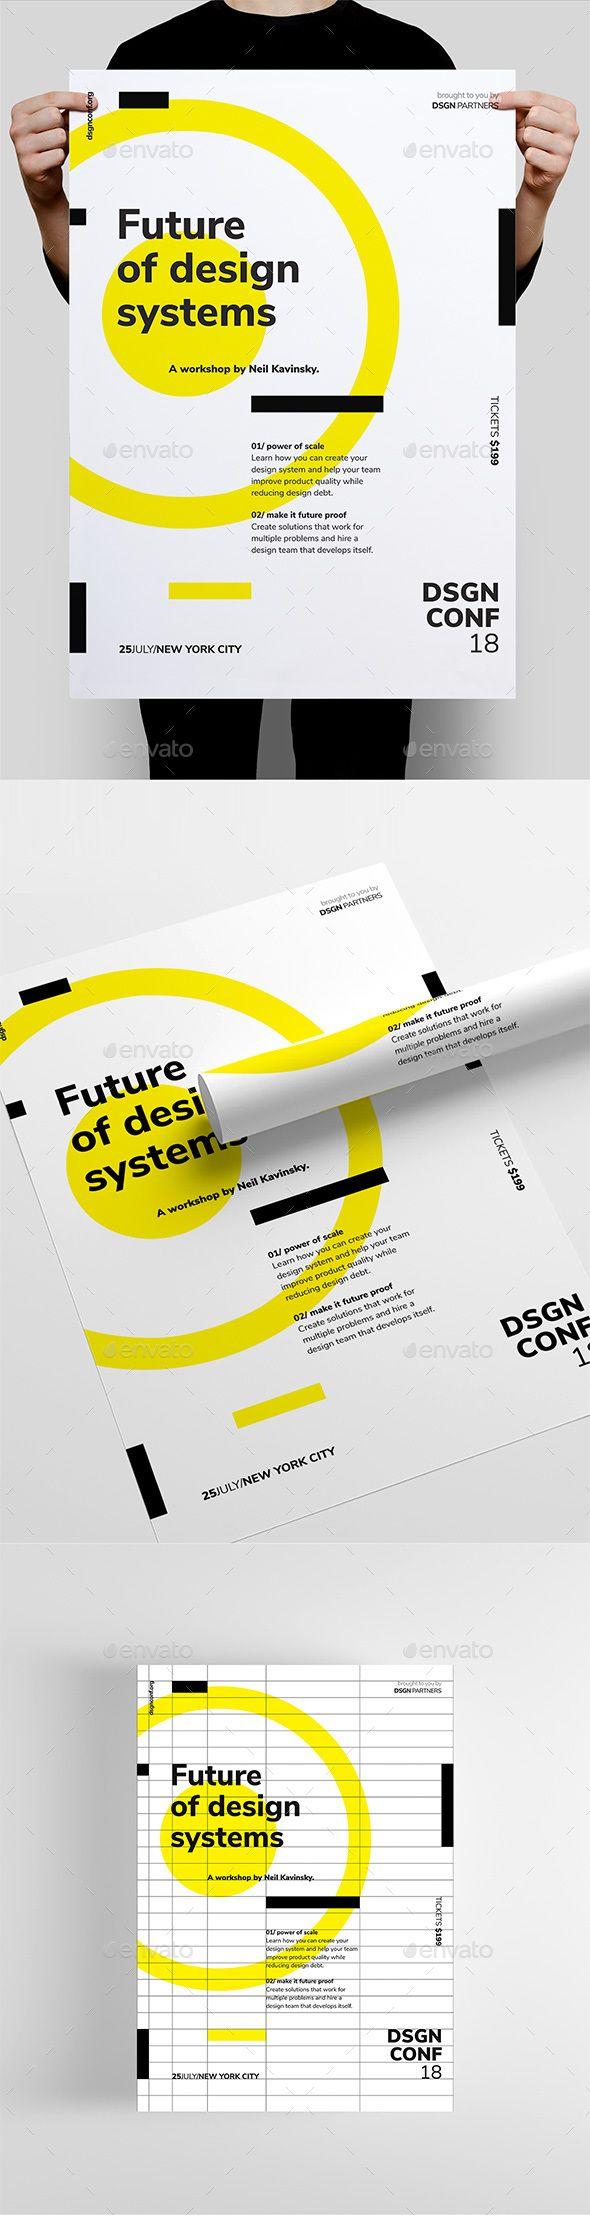 DSGN Series 3 Poster / Flyer Template — Photoshop PSD #webinar #programming • Download ➝ graphicriver.net/…